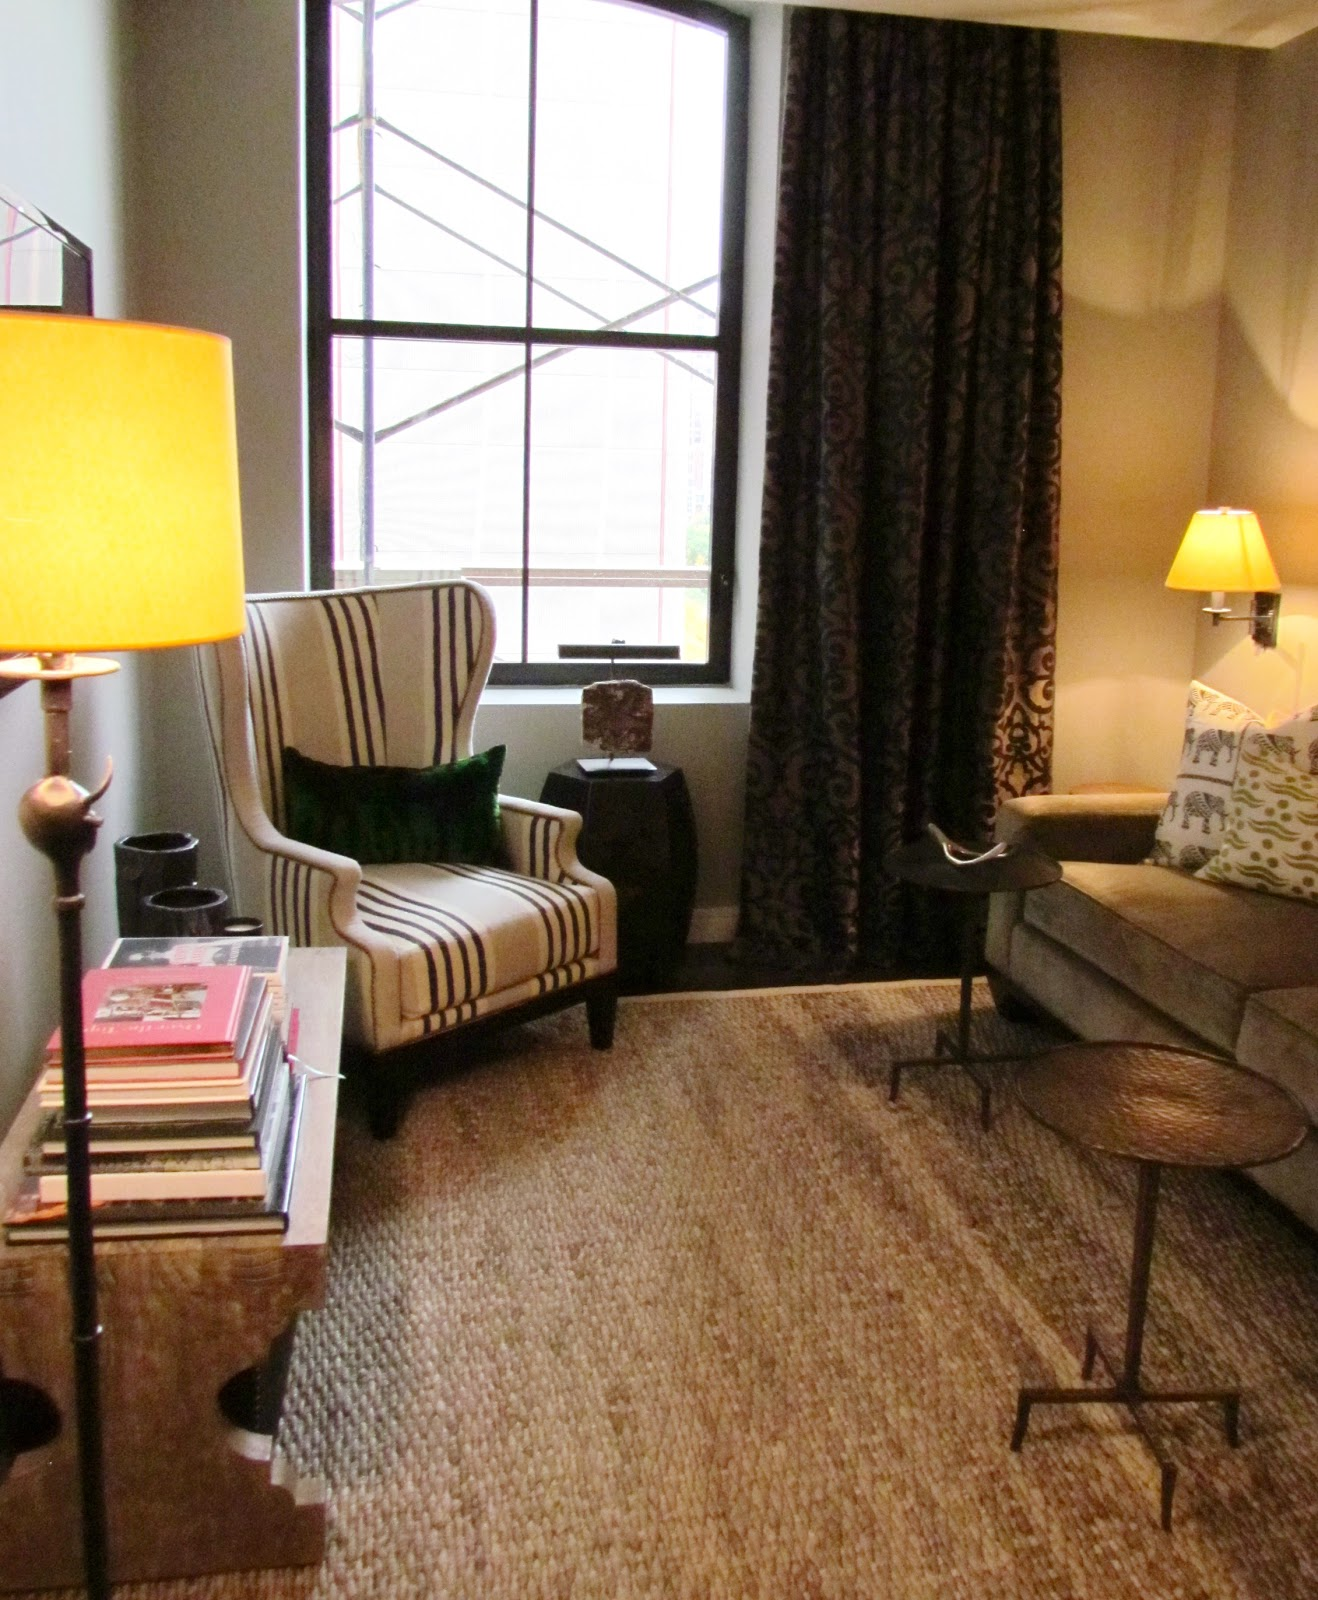 antony todd sofa pink app dec a porter imagination home designer visions